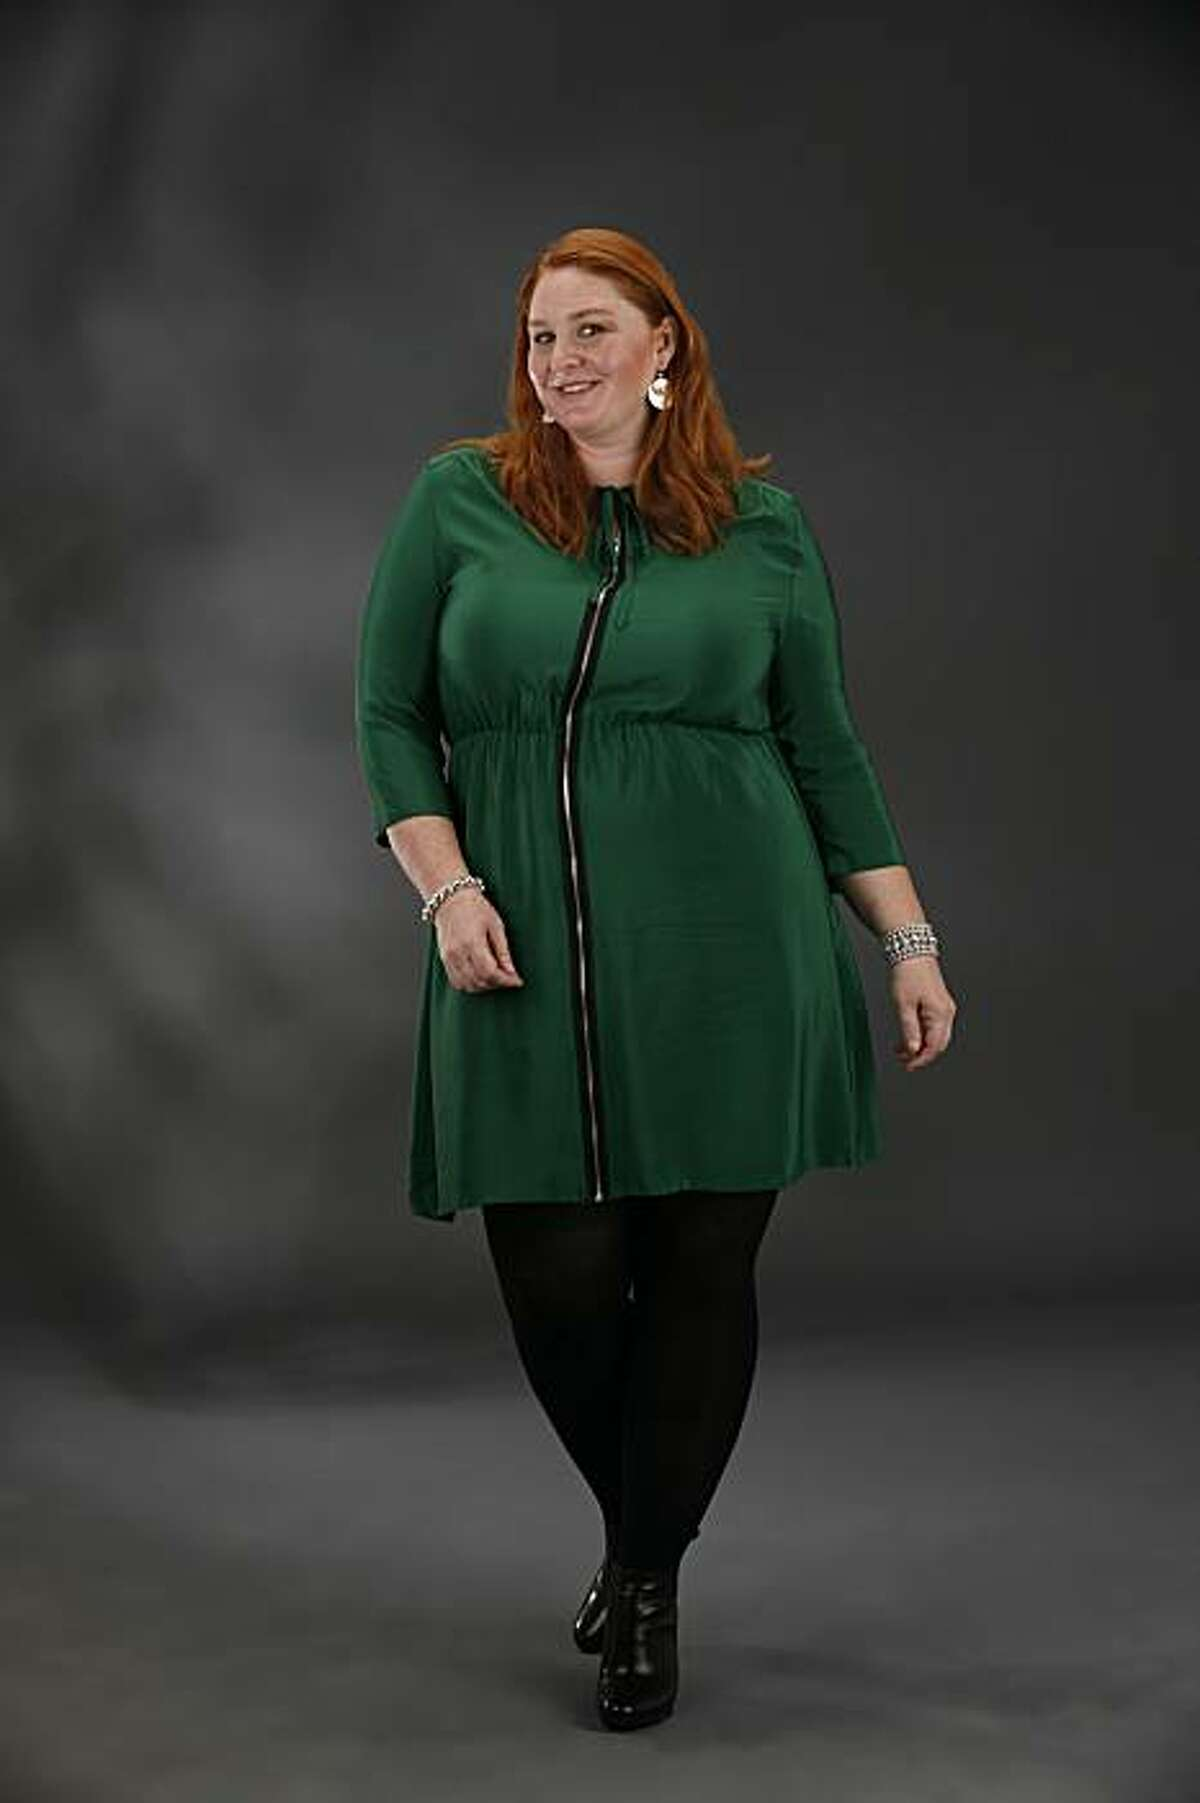 Model Dana Roeting of Marla Dell Talent SF shows an Amanda Uprichard silk zip front dress ($300, mariedenee.com); Via Spiga ankle boot ($260, Macy's West); and Betty Carre earrings ($40, Go Figure, San Francisco).